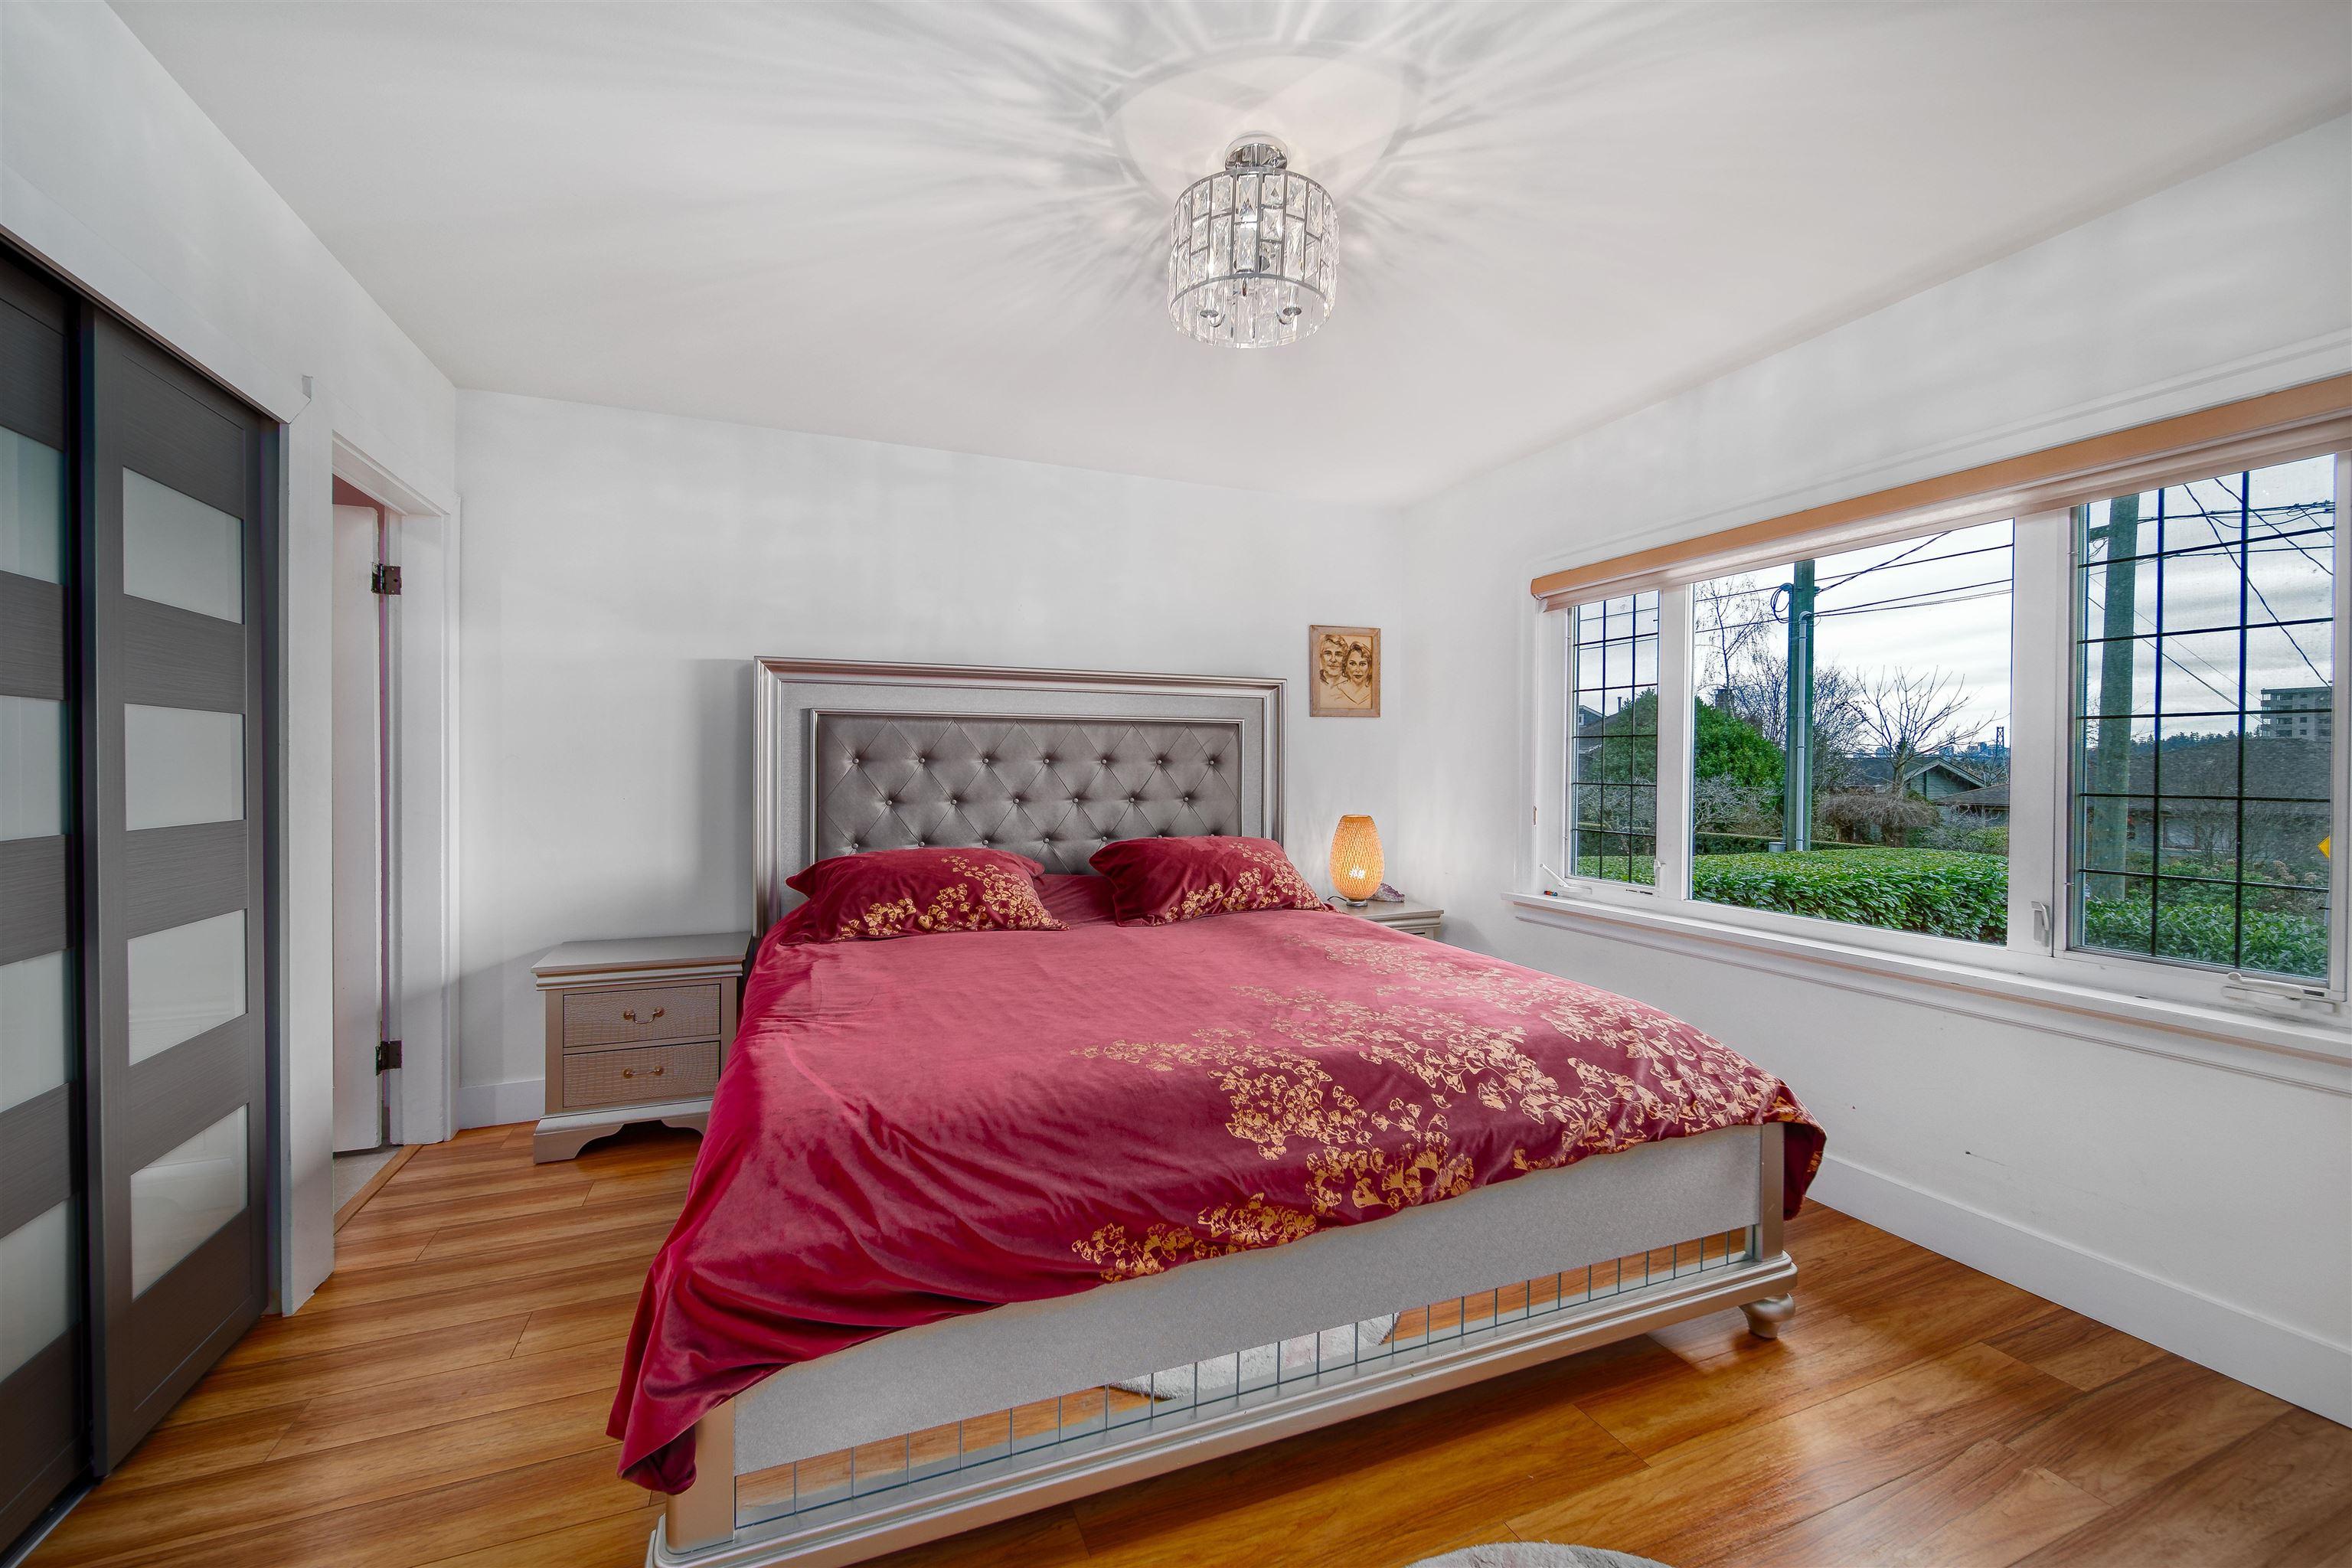 1357 FULTON AVENUE - Ambleside House/Single Family for sale, 6 Bedrooms (R2617731) - #18